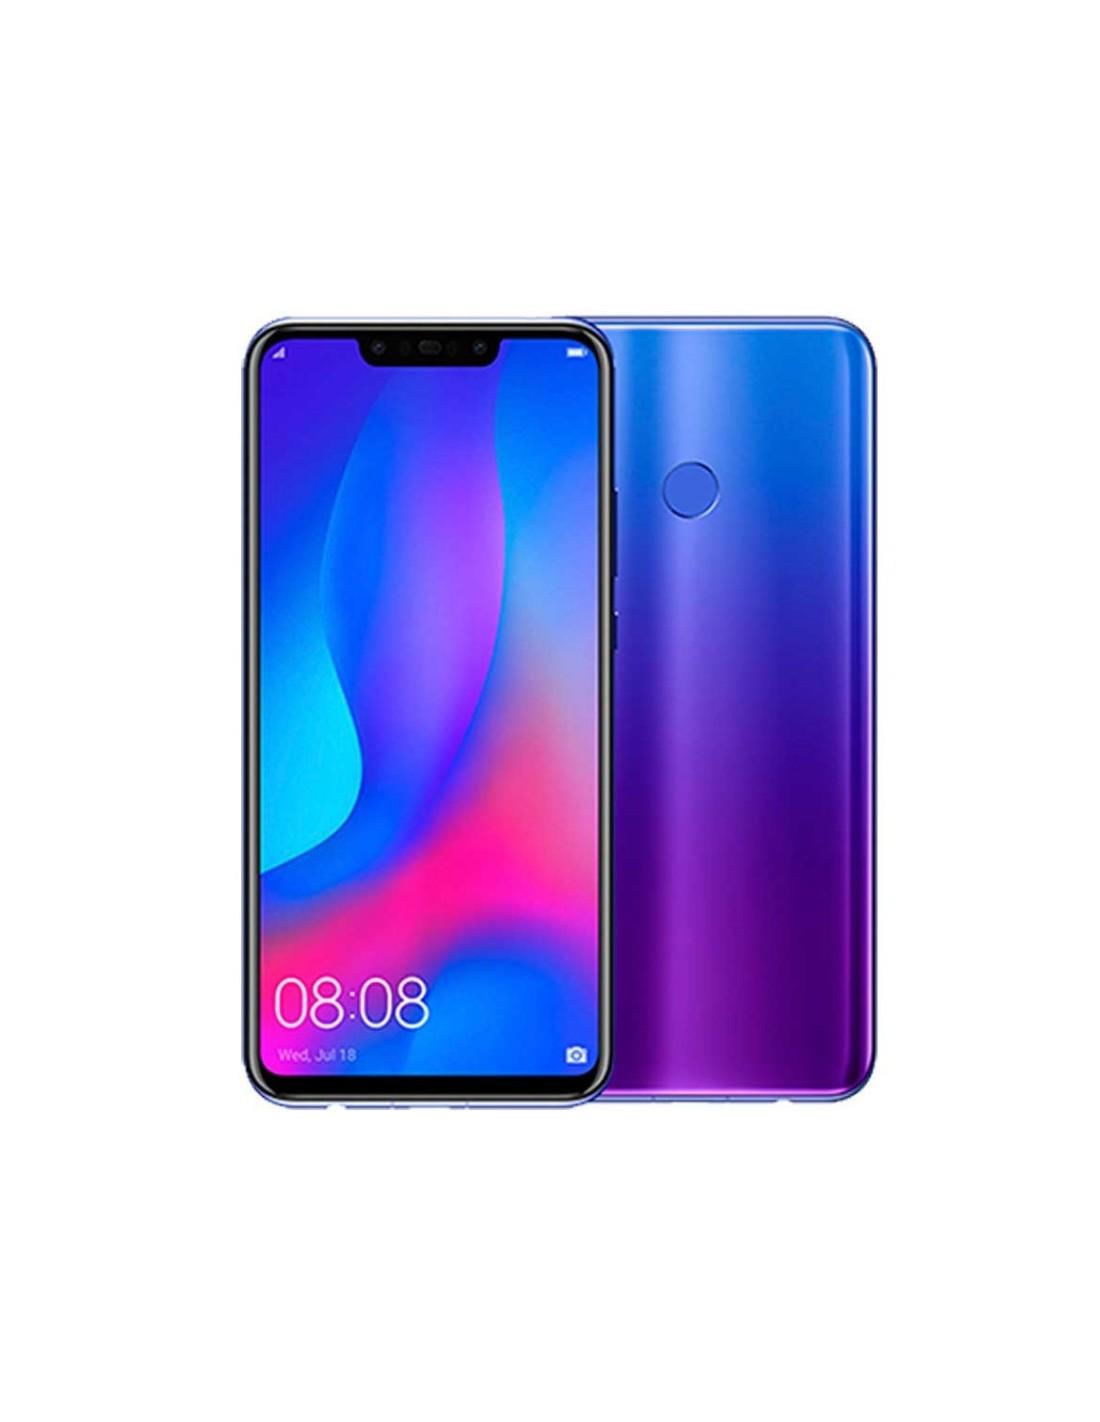 Prix Huawei Y9 2019 Hu Y9 Purple Violet Tunisie Technopro